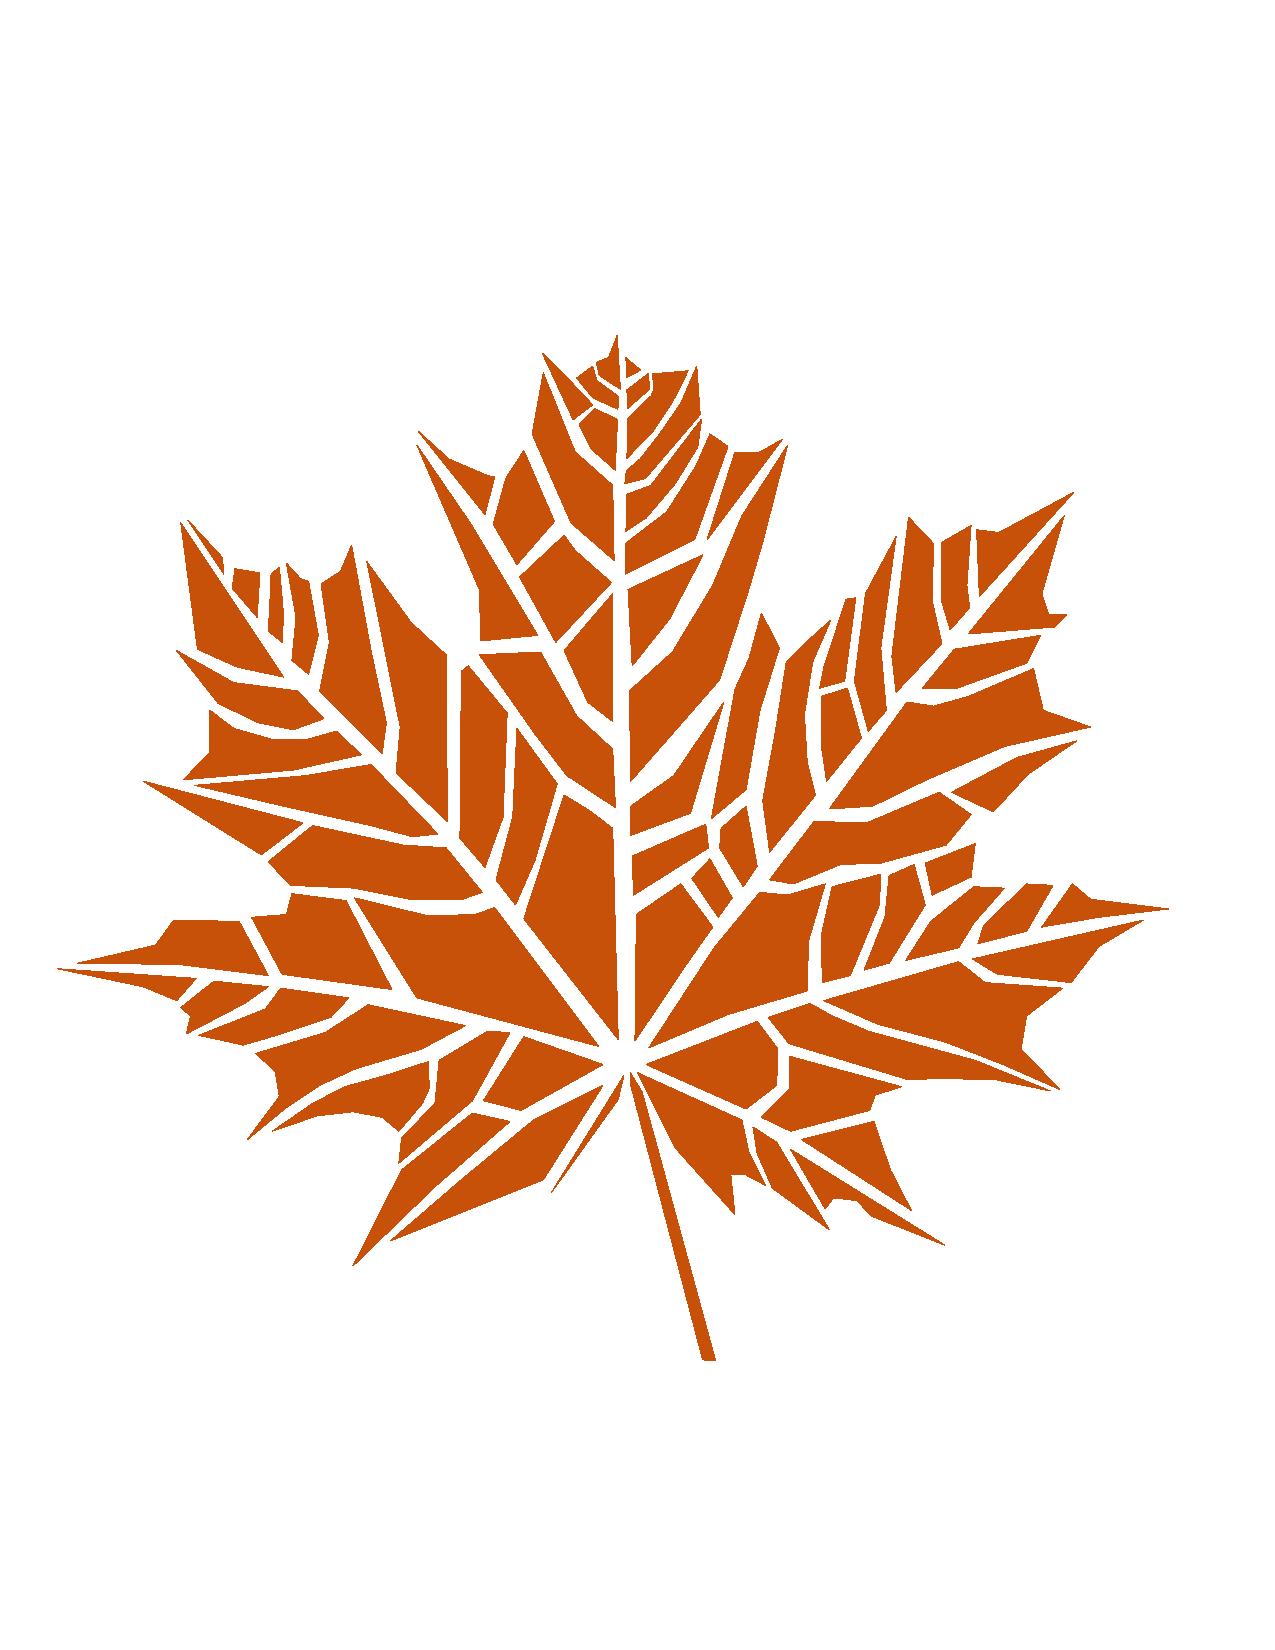 Leafdichotomy 02